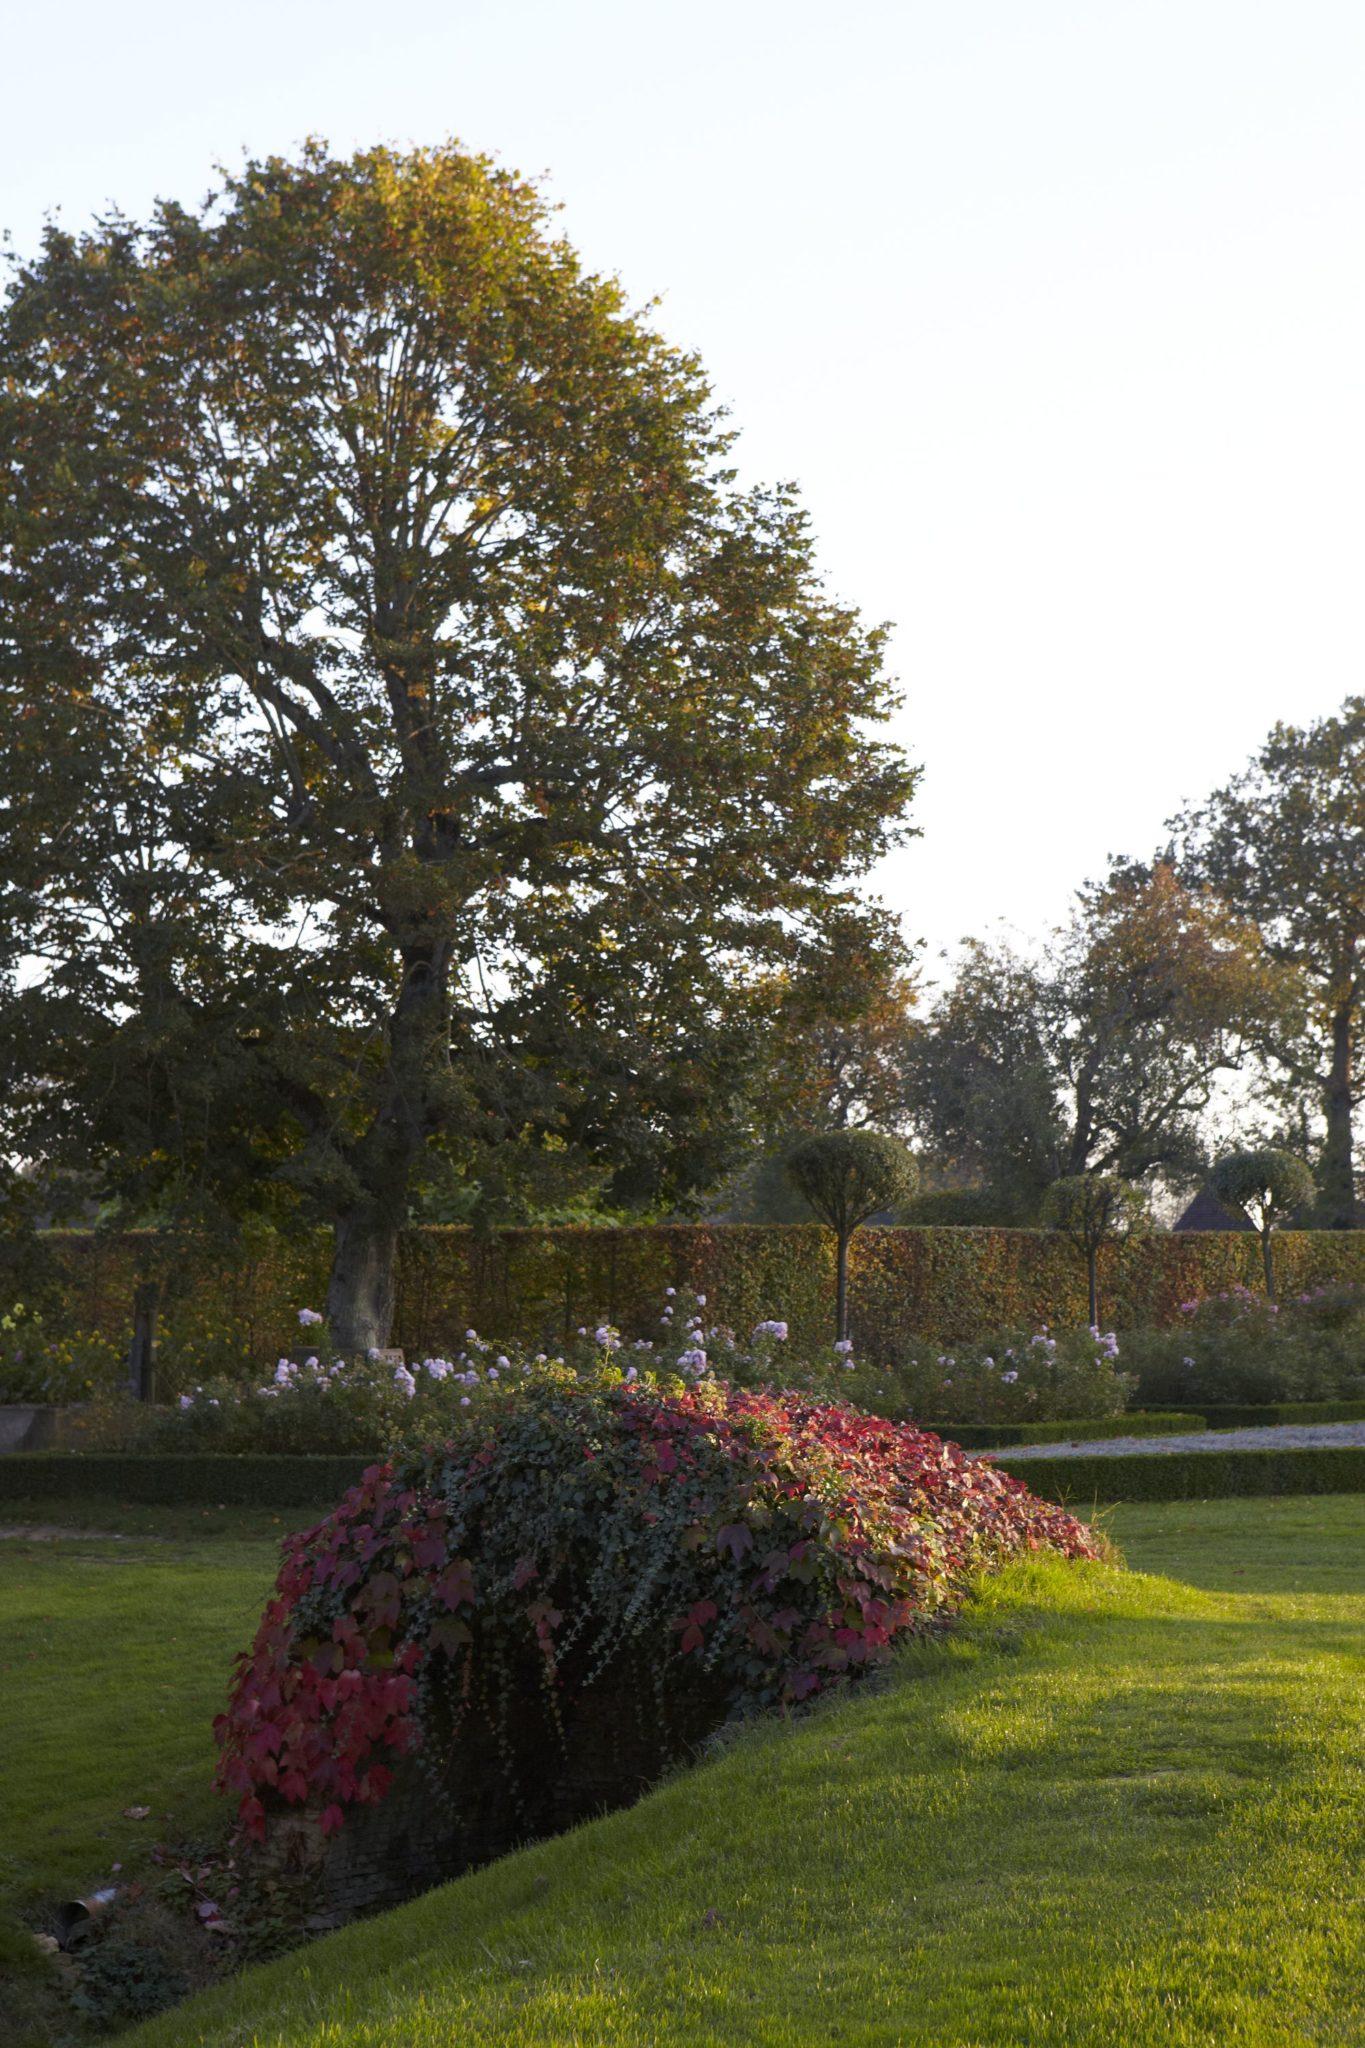 Le jardin de la borde leugny en puisaye dans l 39 yonne for Borde para jardin